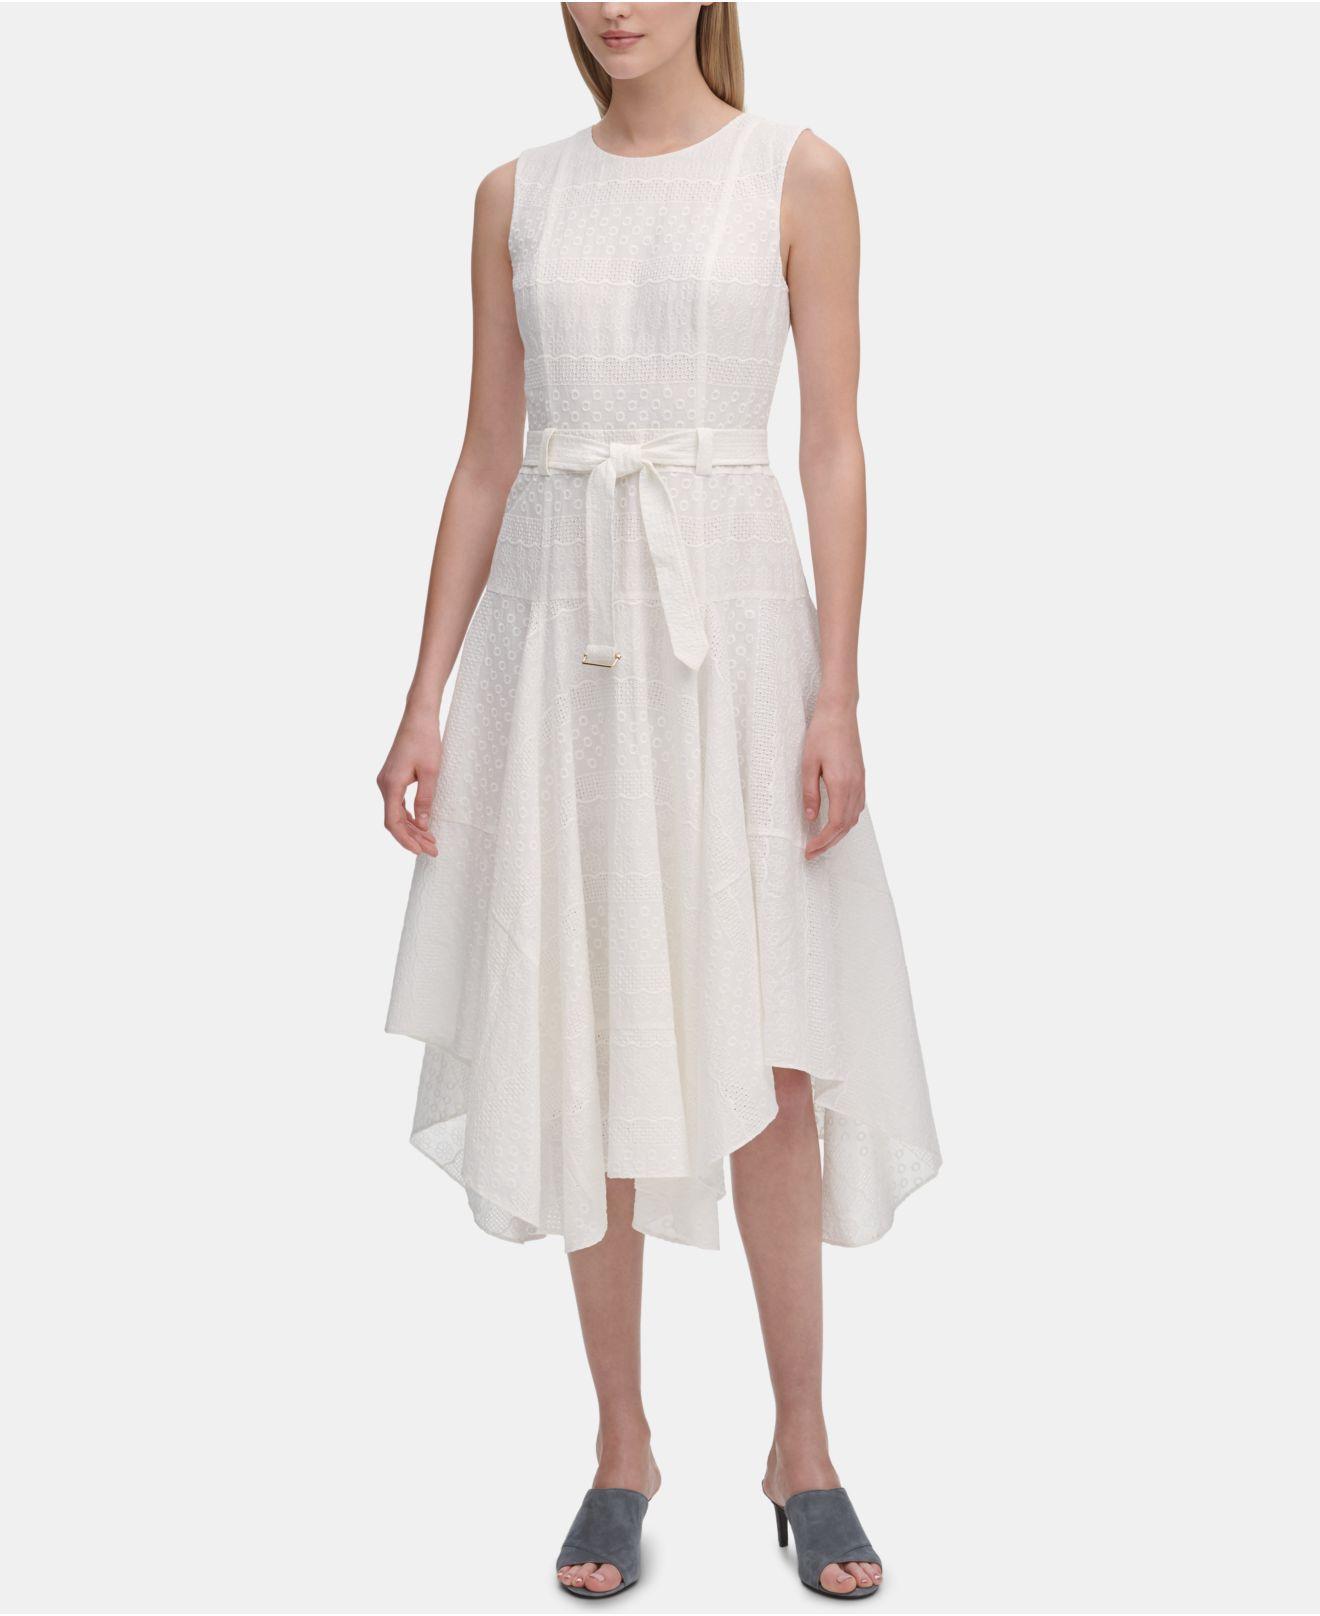 1374a10e0c Lyst - Calvin Klein Eyelet Handkerchief-hem Sleeveless Dress in White